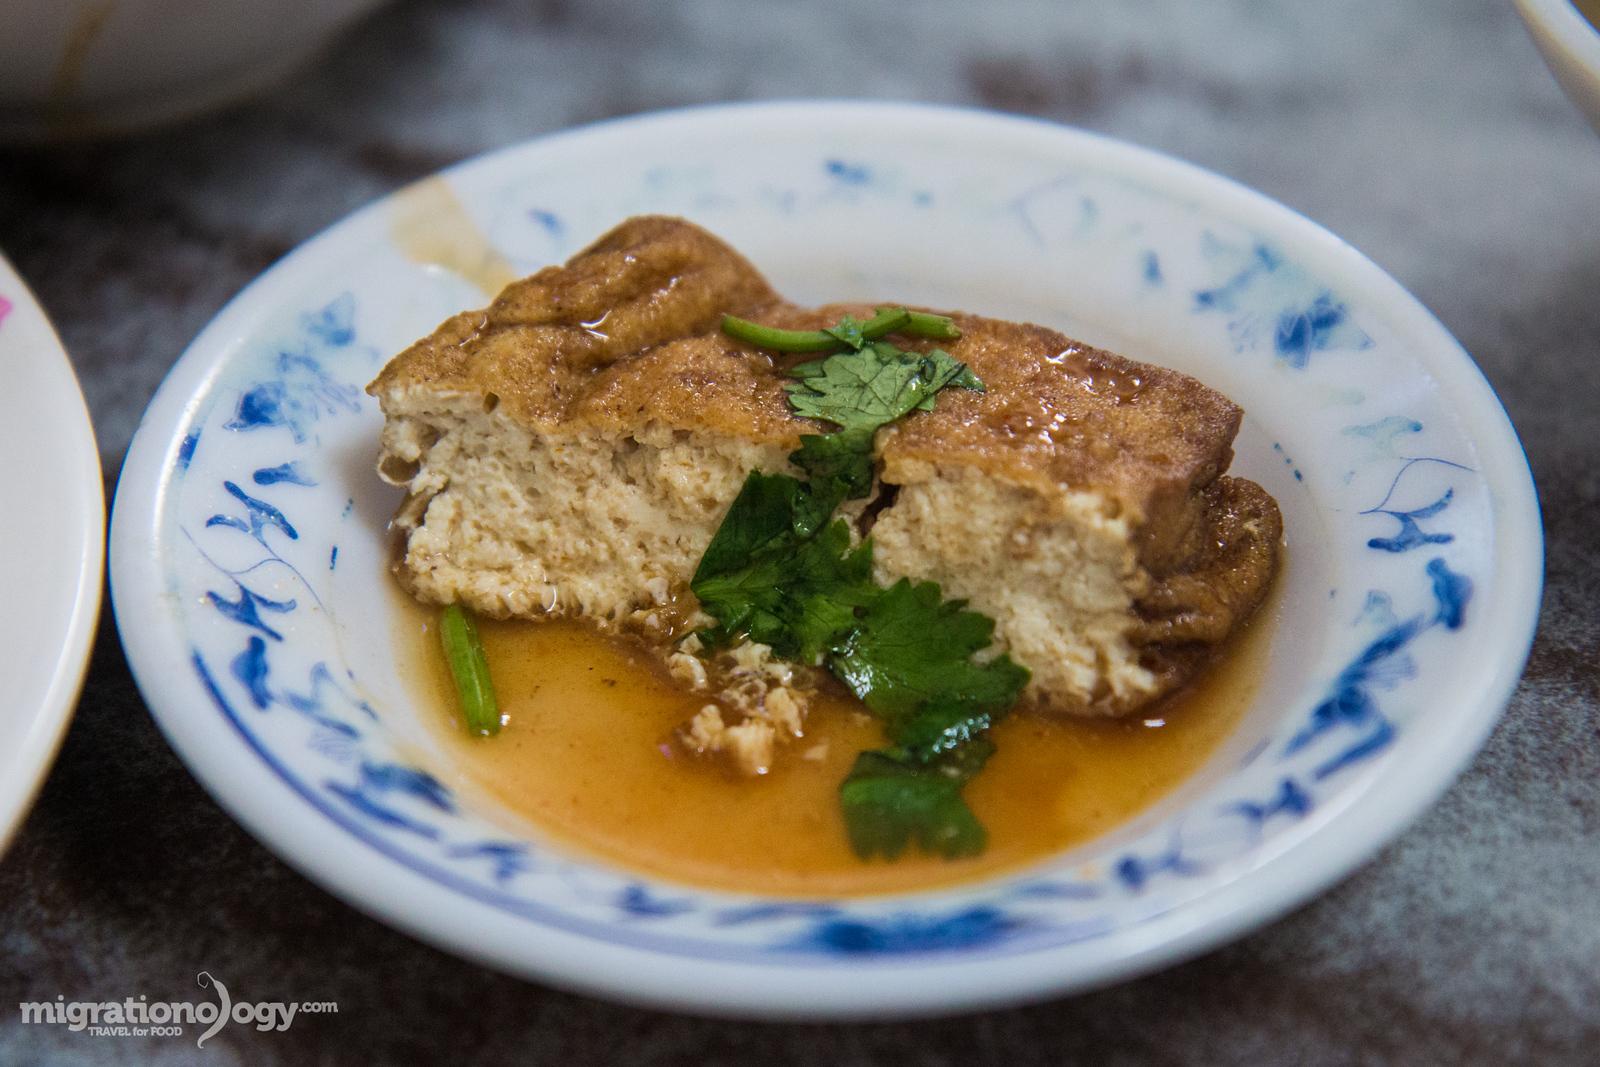 Taiwanese tofu